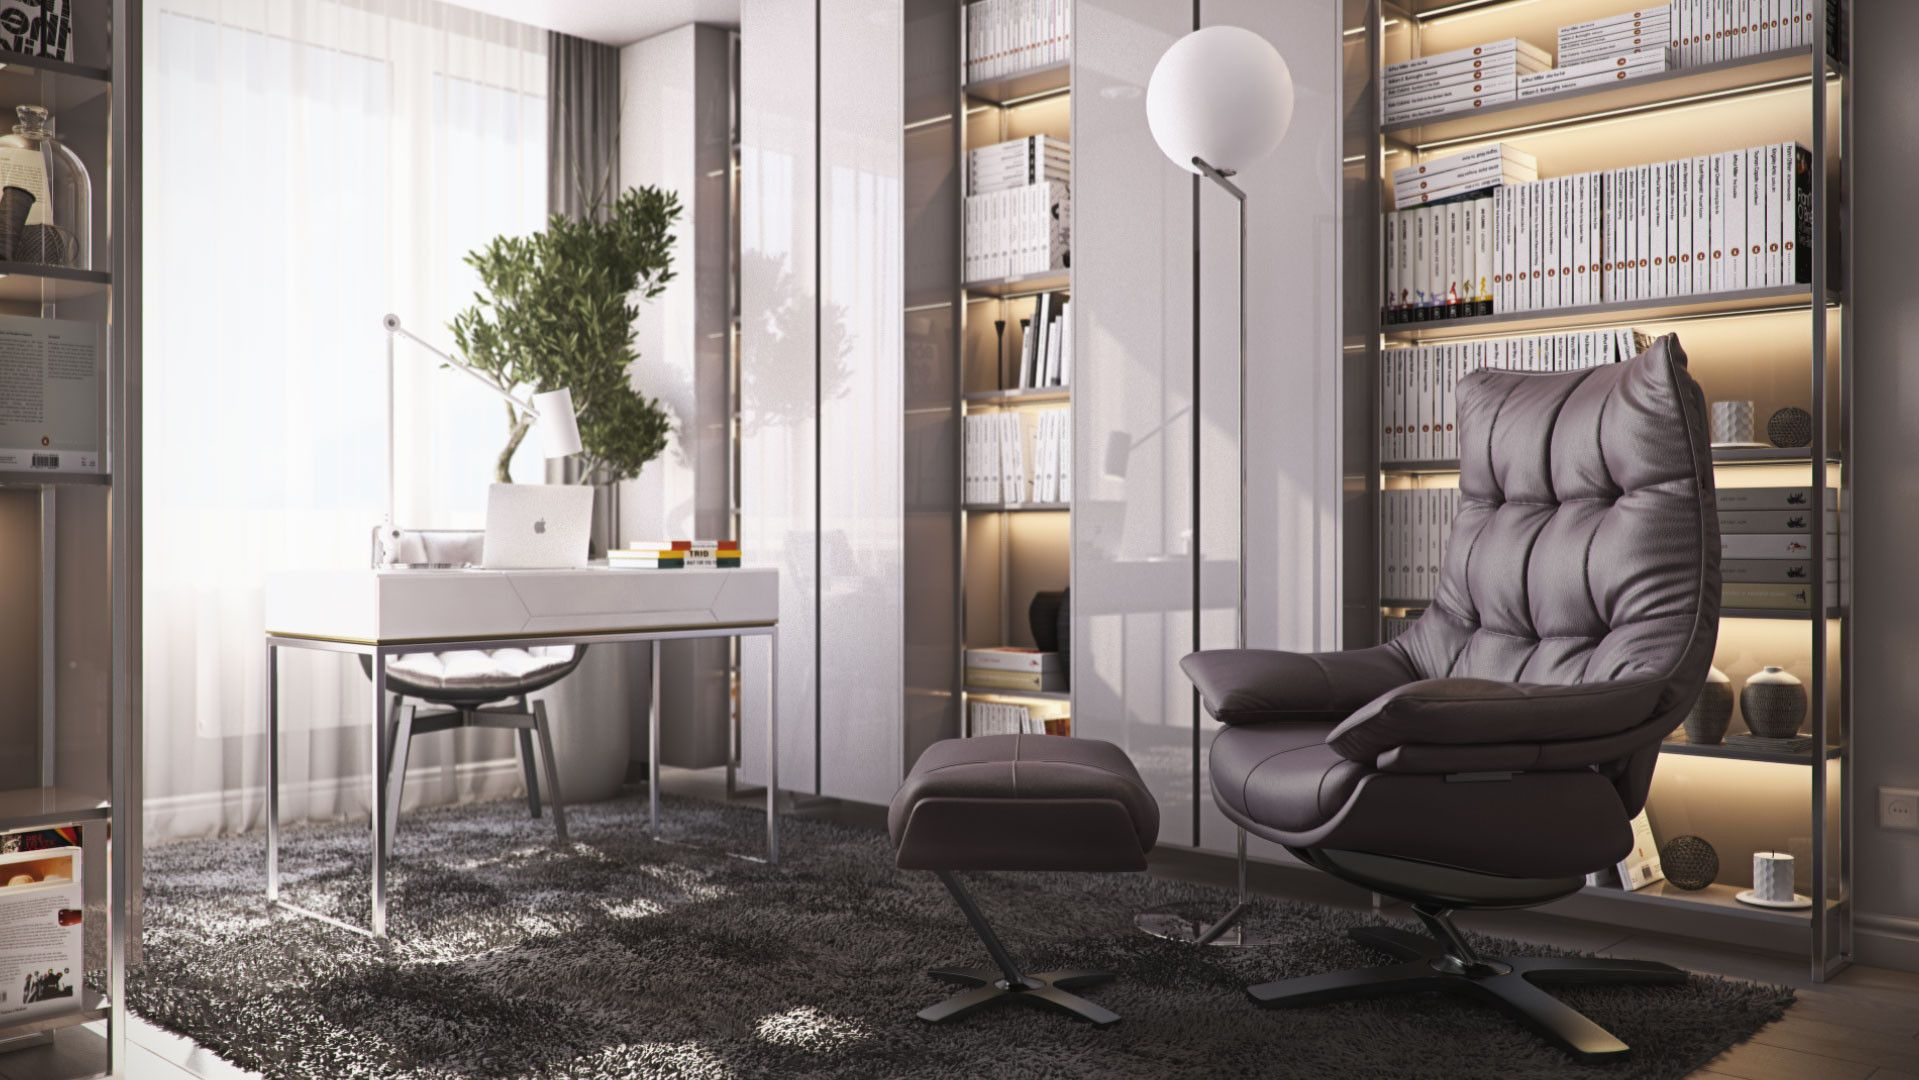 Musa Studio  Interior Design  Gabinet  Pinterest  Studio Entrancing One Bedroom Apartment Designs Example Decorating Inspiration